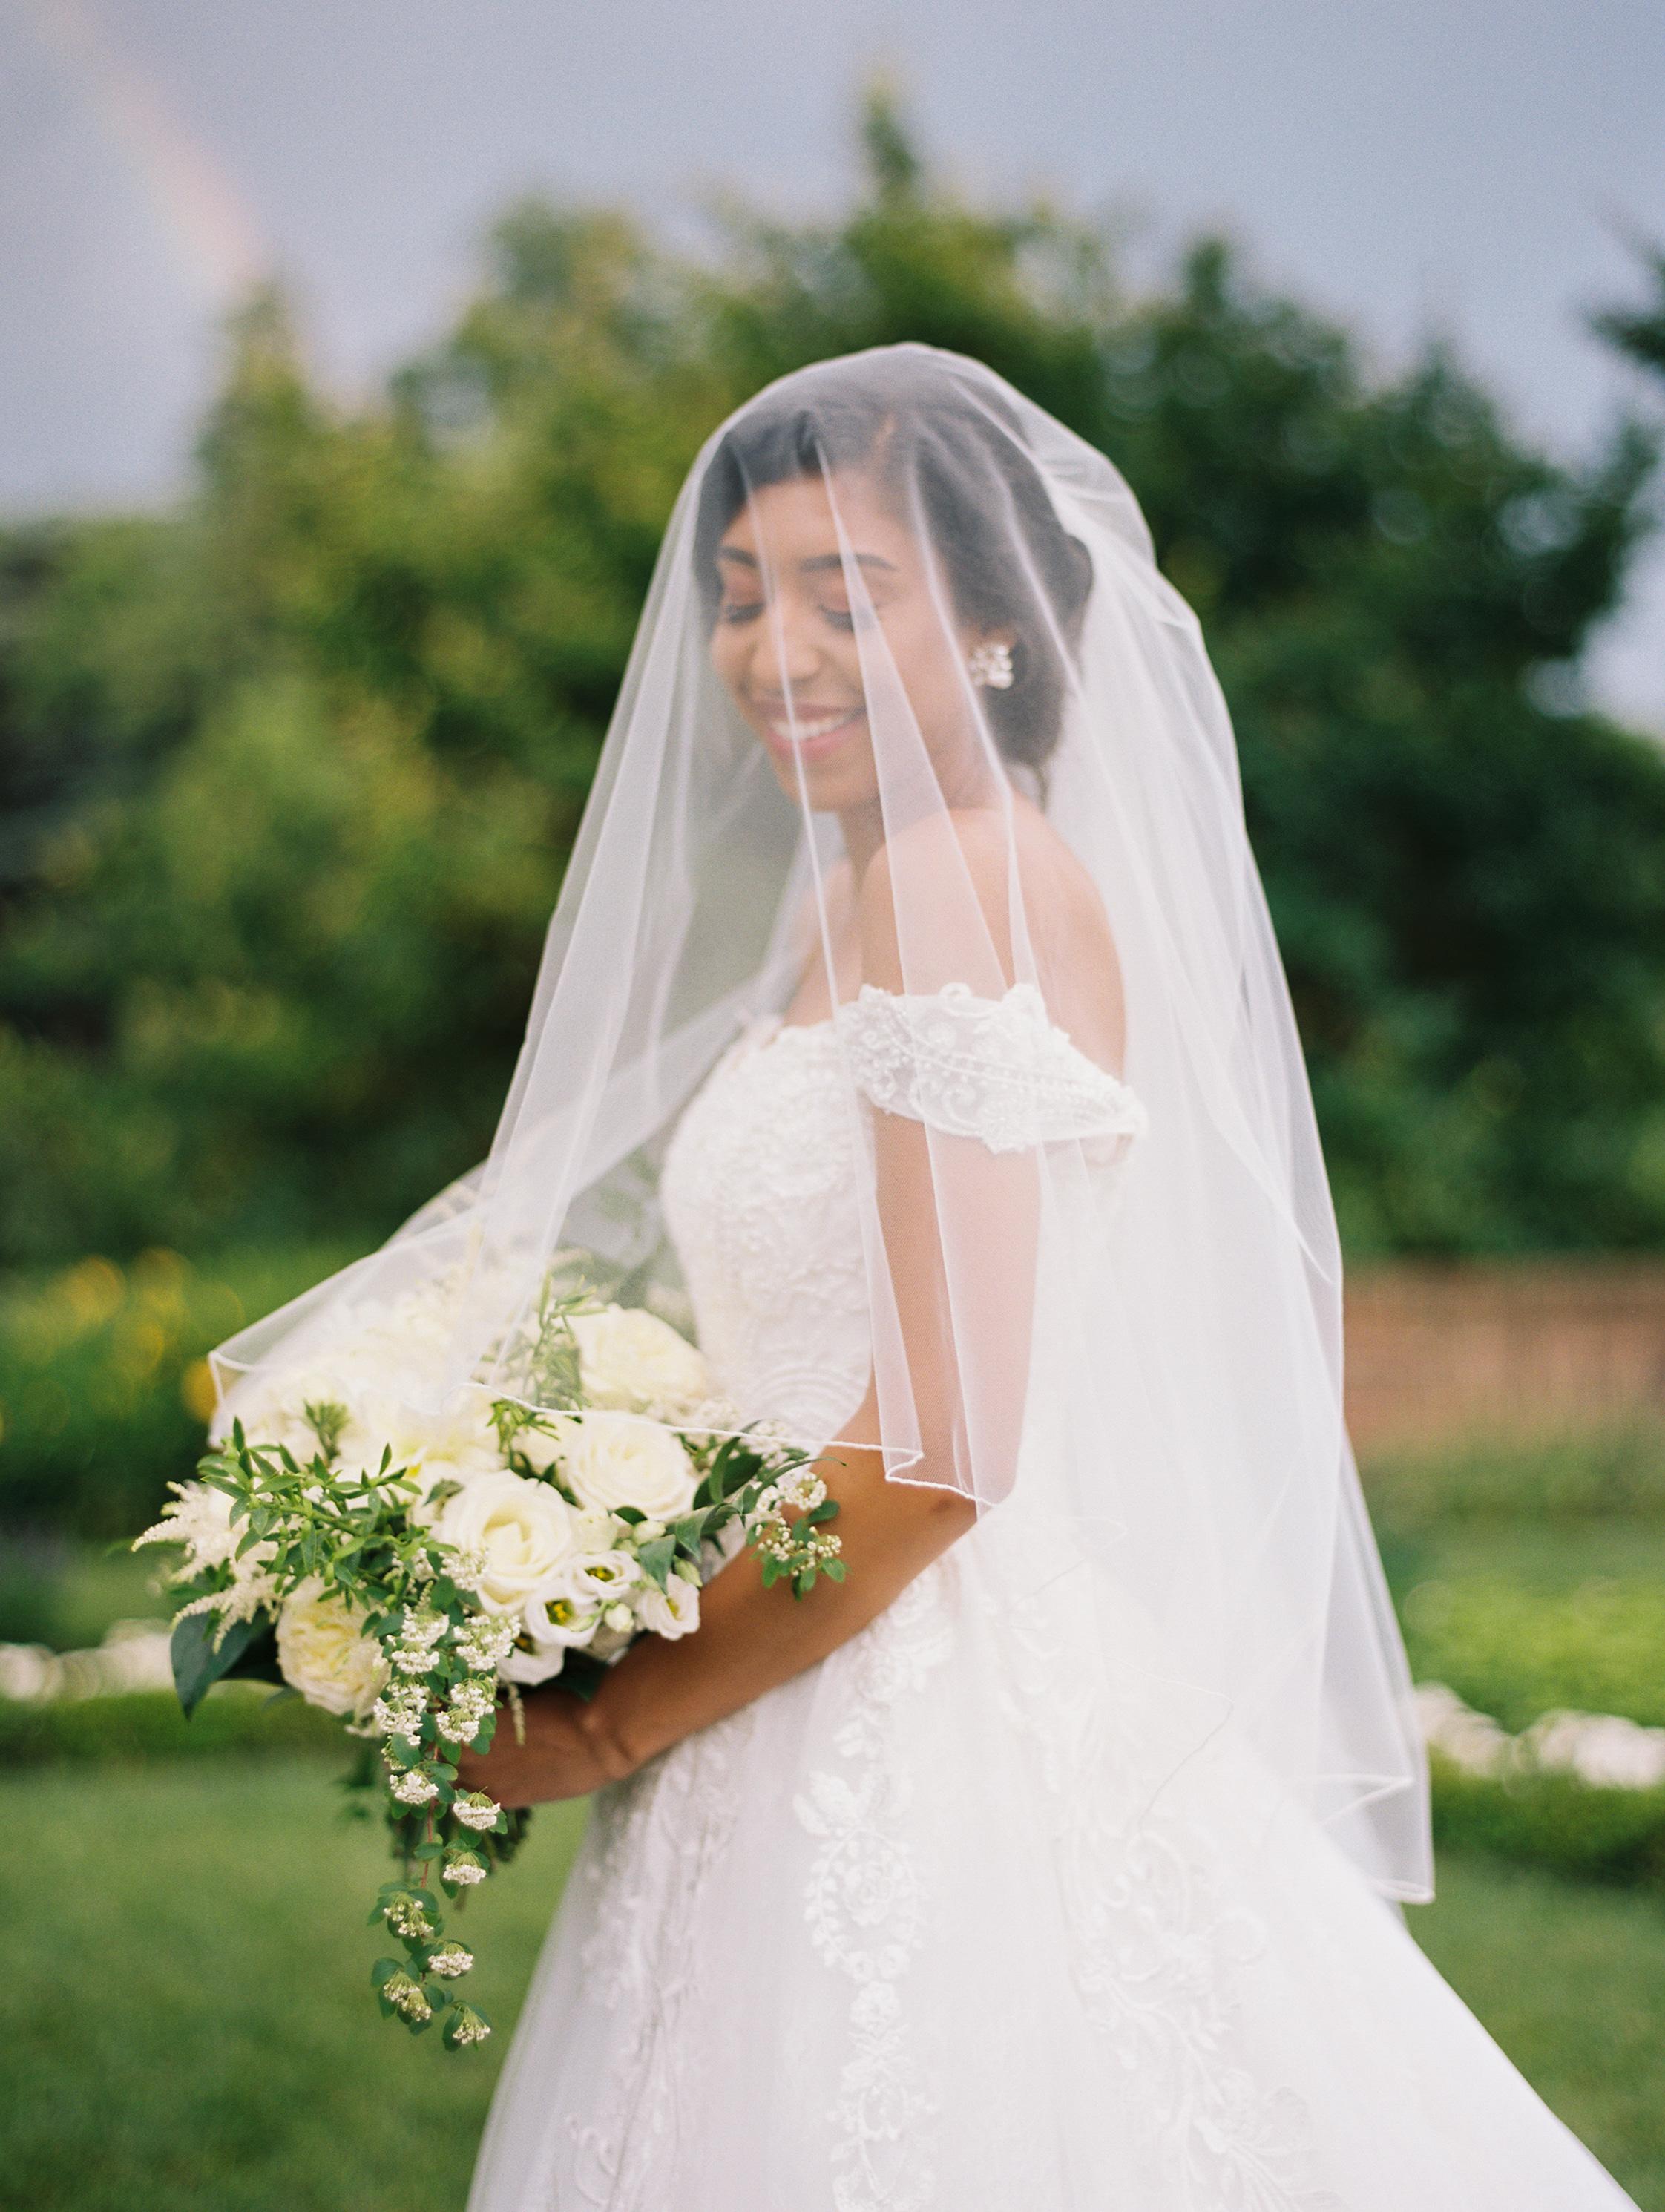 macey joshua wedding bride holding bouquet